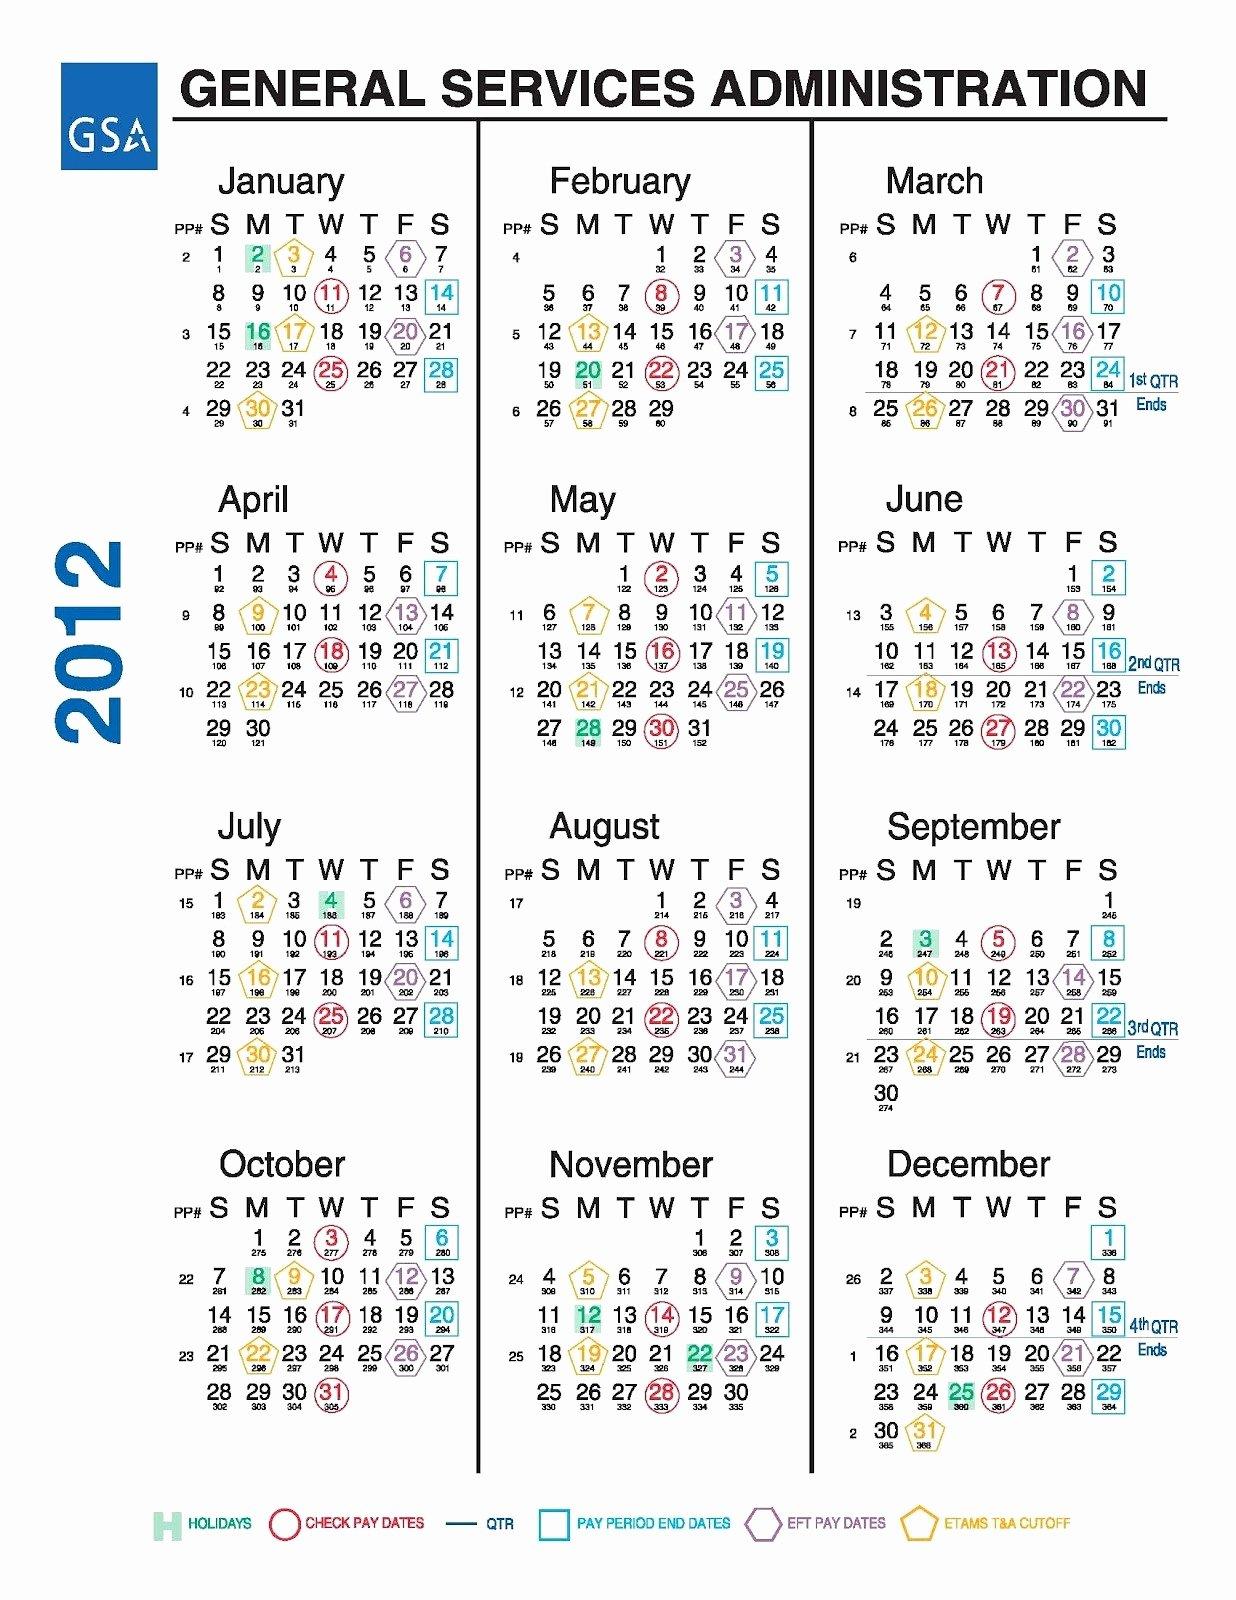 2017 Biweekly Payroll Calendar Template Fresh 50 Opm Pay Period Calendar 2017 Tu4p – Arichika 2019